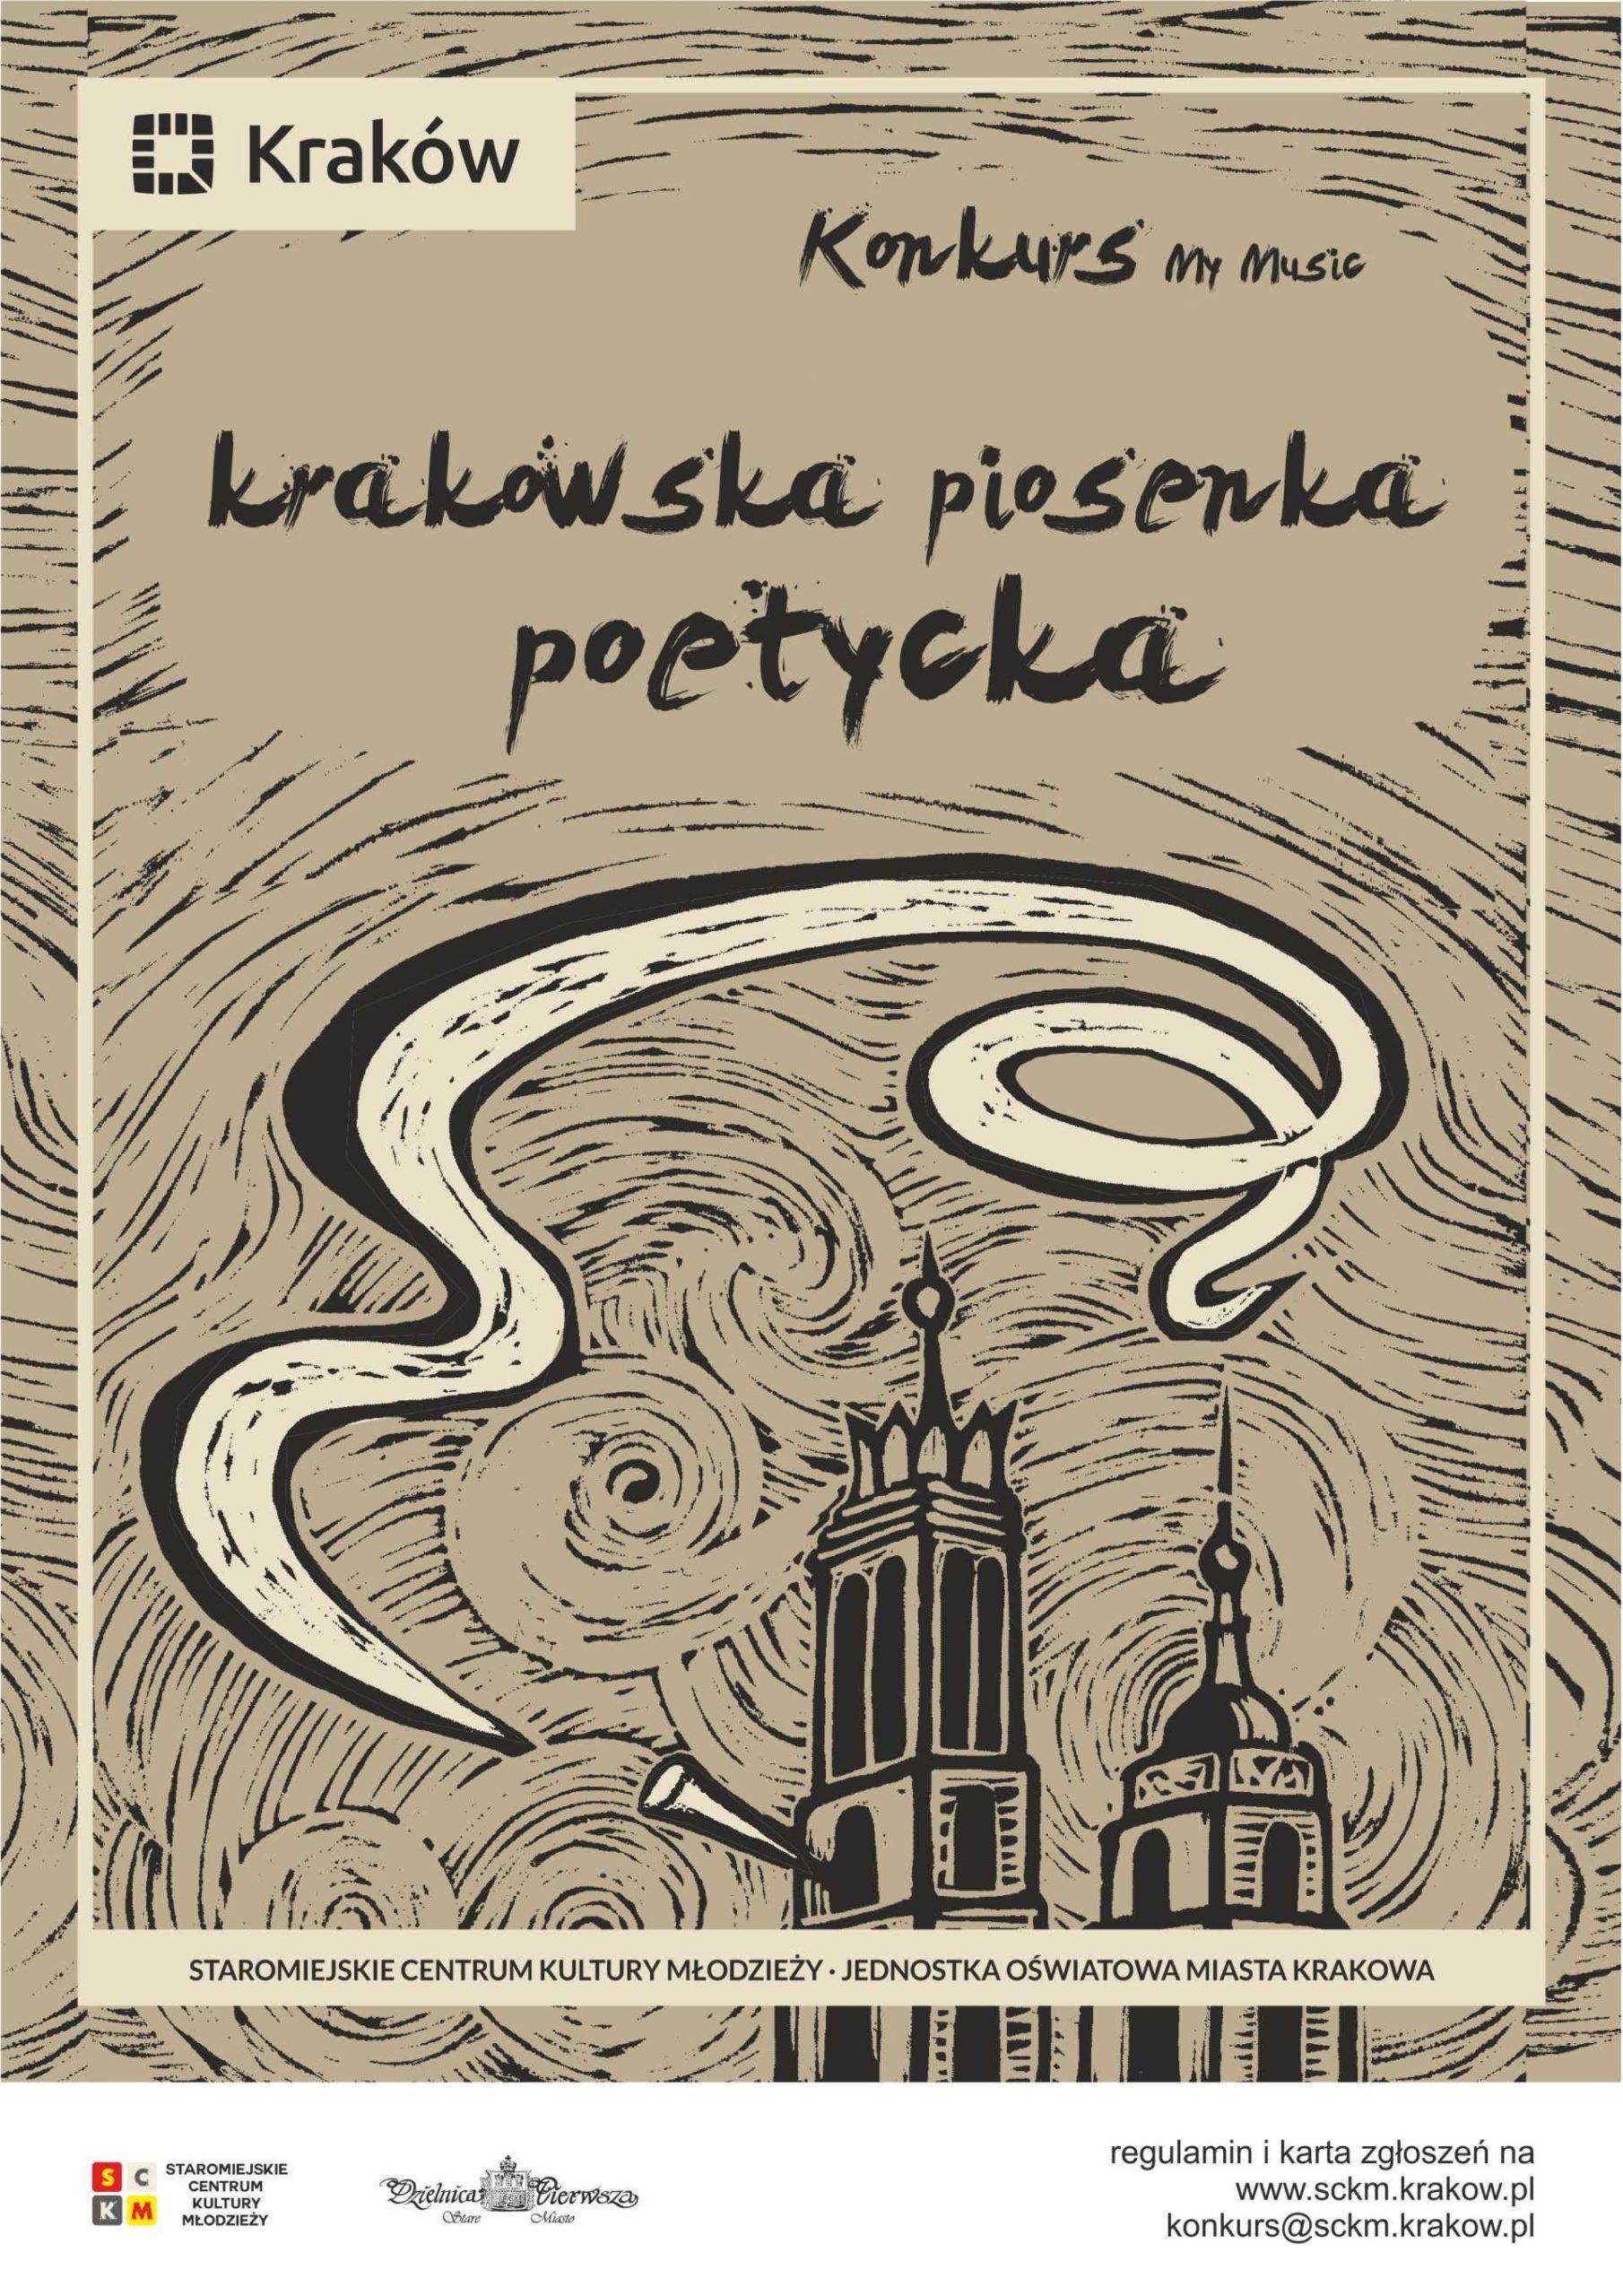 My Music – krakowska piosenka poetycka